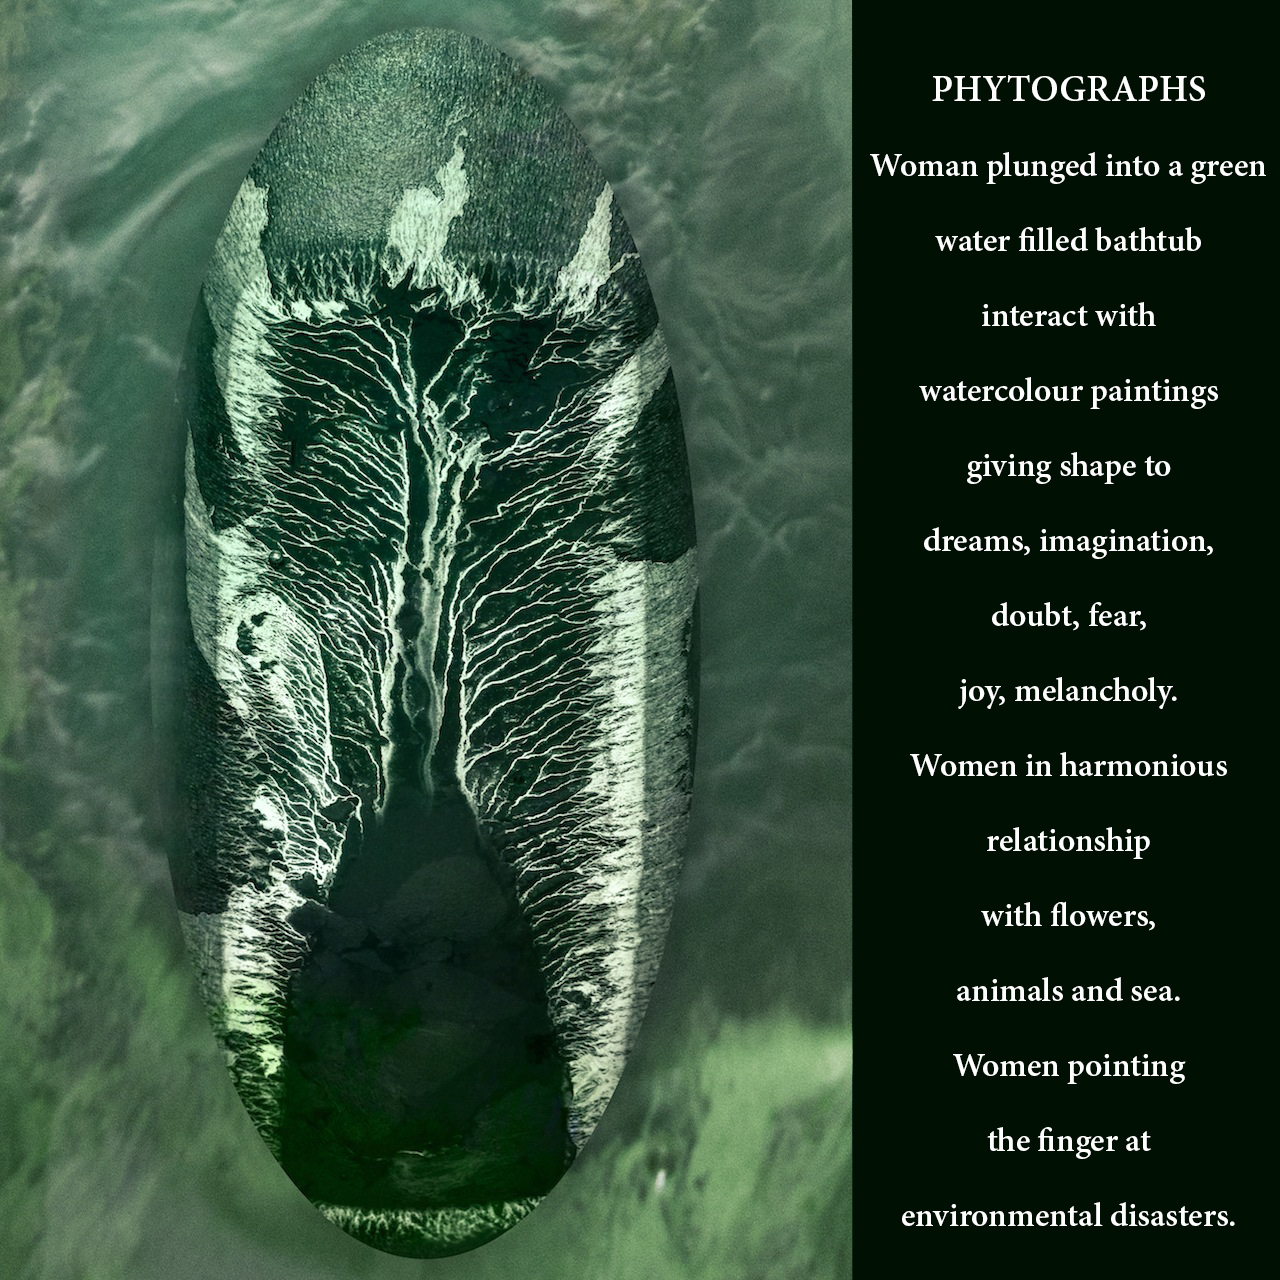 FITOGRAFIE